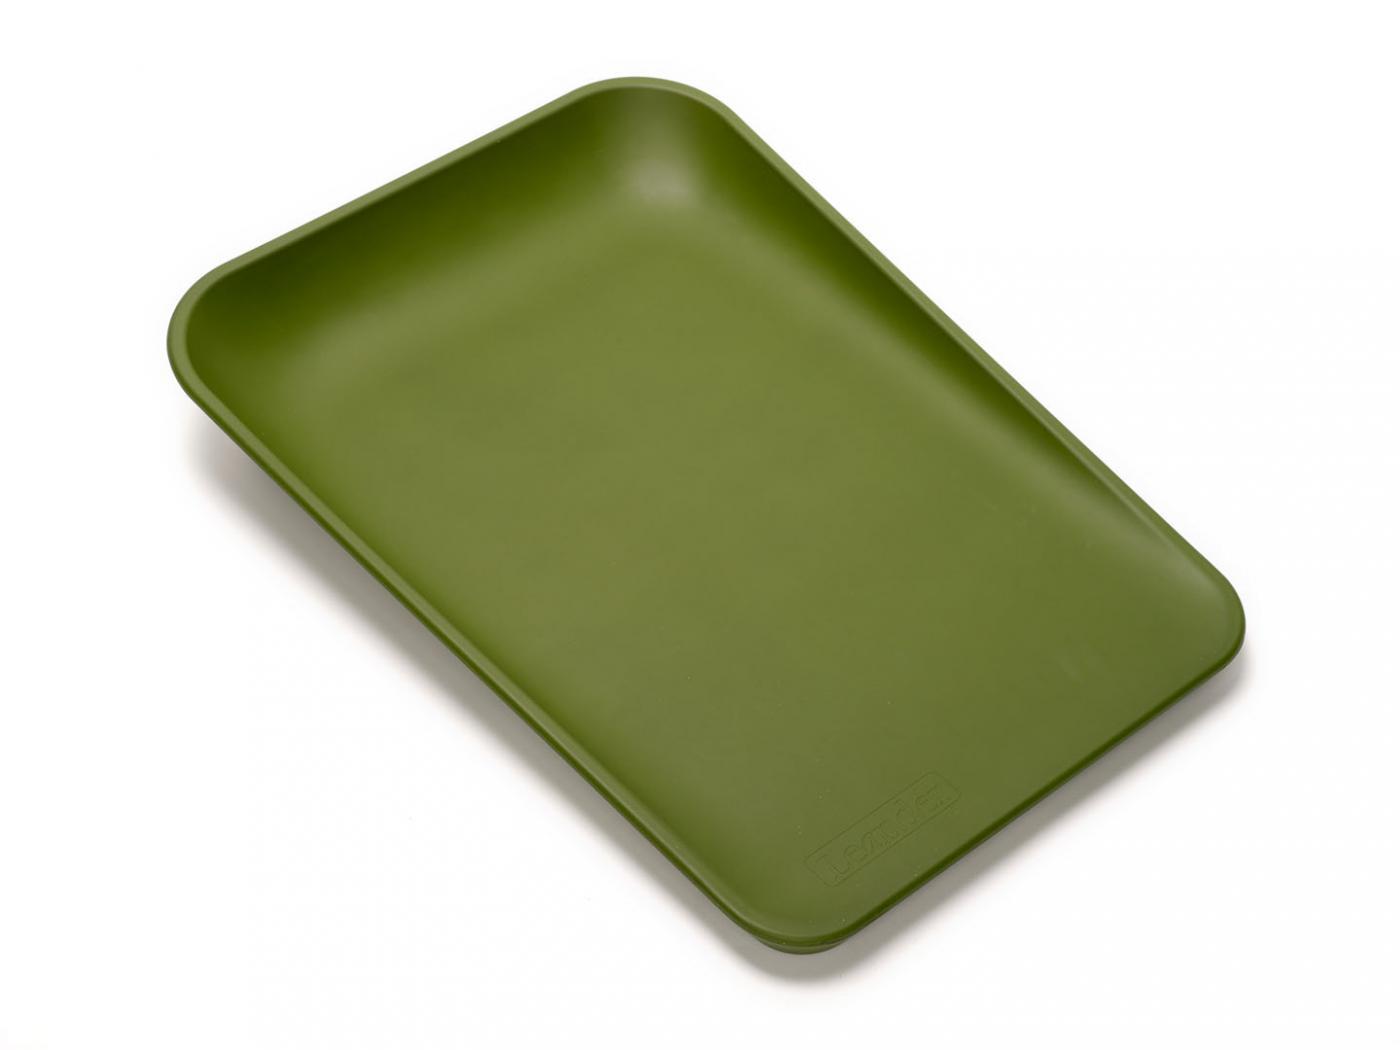 Leander matelas langer matty vert - Matelas a langer vert anis ...